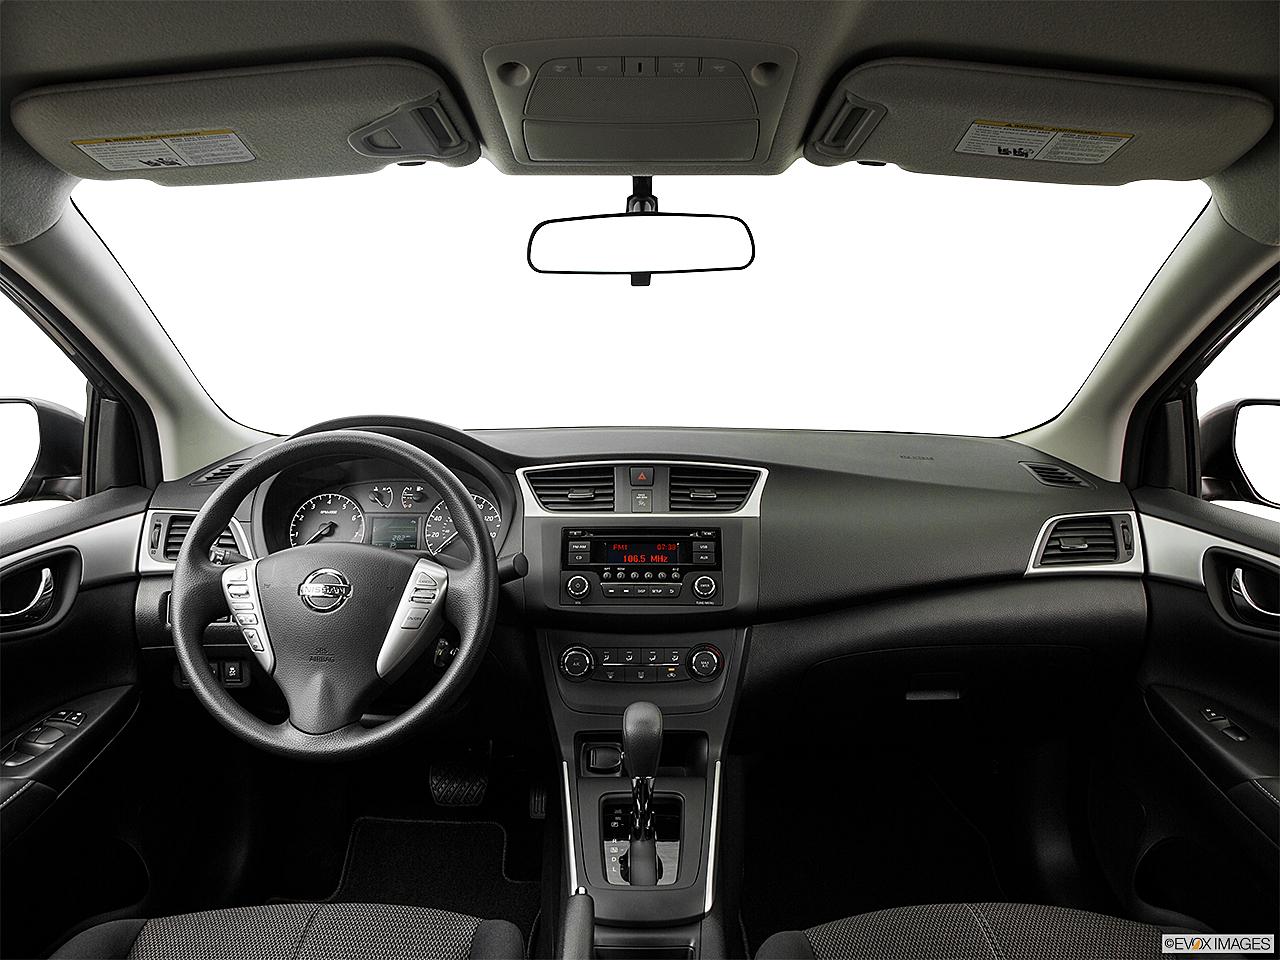 2017 Nissan Sentra Sr Turbo 4dr Sedan Cvt Research Groovecar